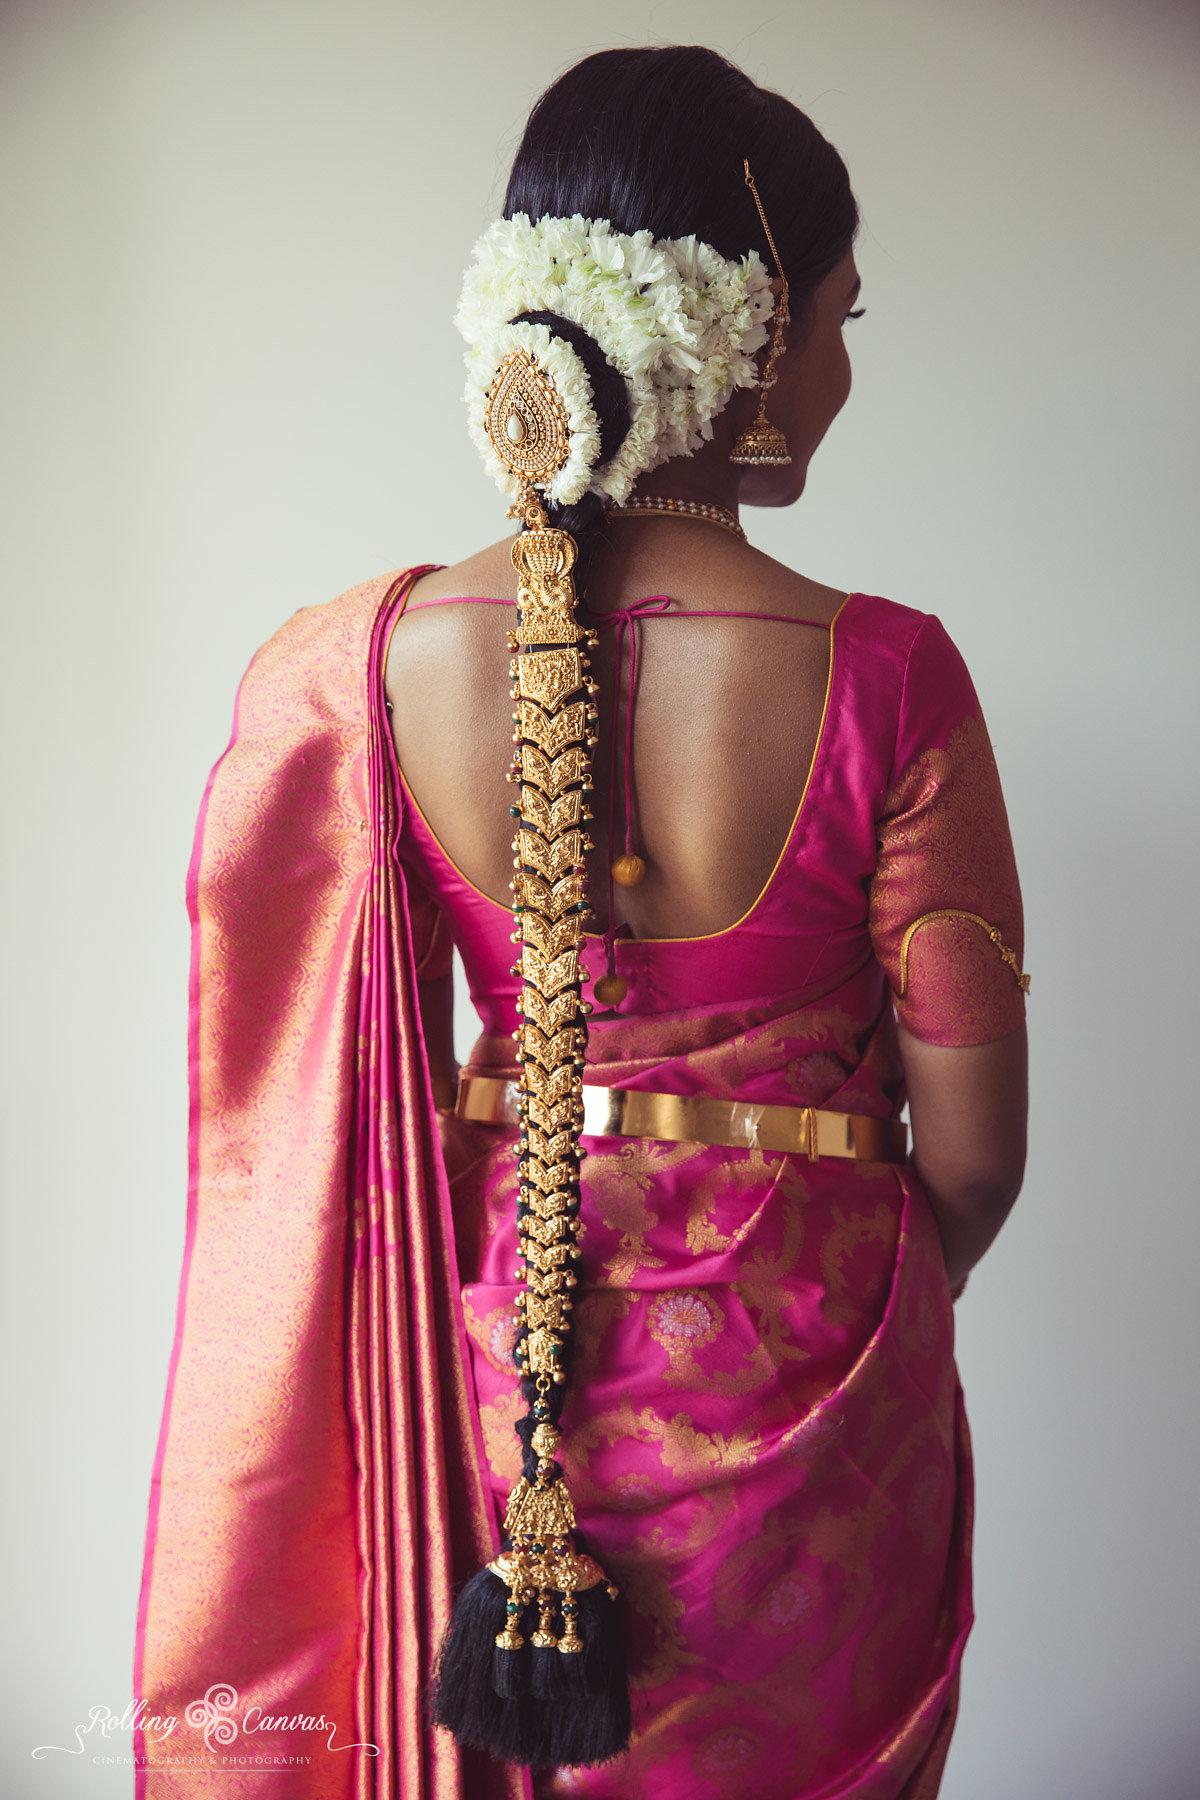 Wedding_Photography_Sydney_Rolling_Canvas_Presentation_Hindu_Sri_Lankan_Bride_Sari_Sydney-57021.jpg